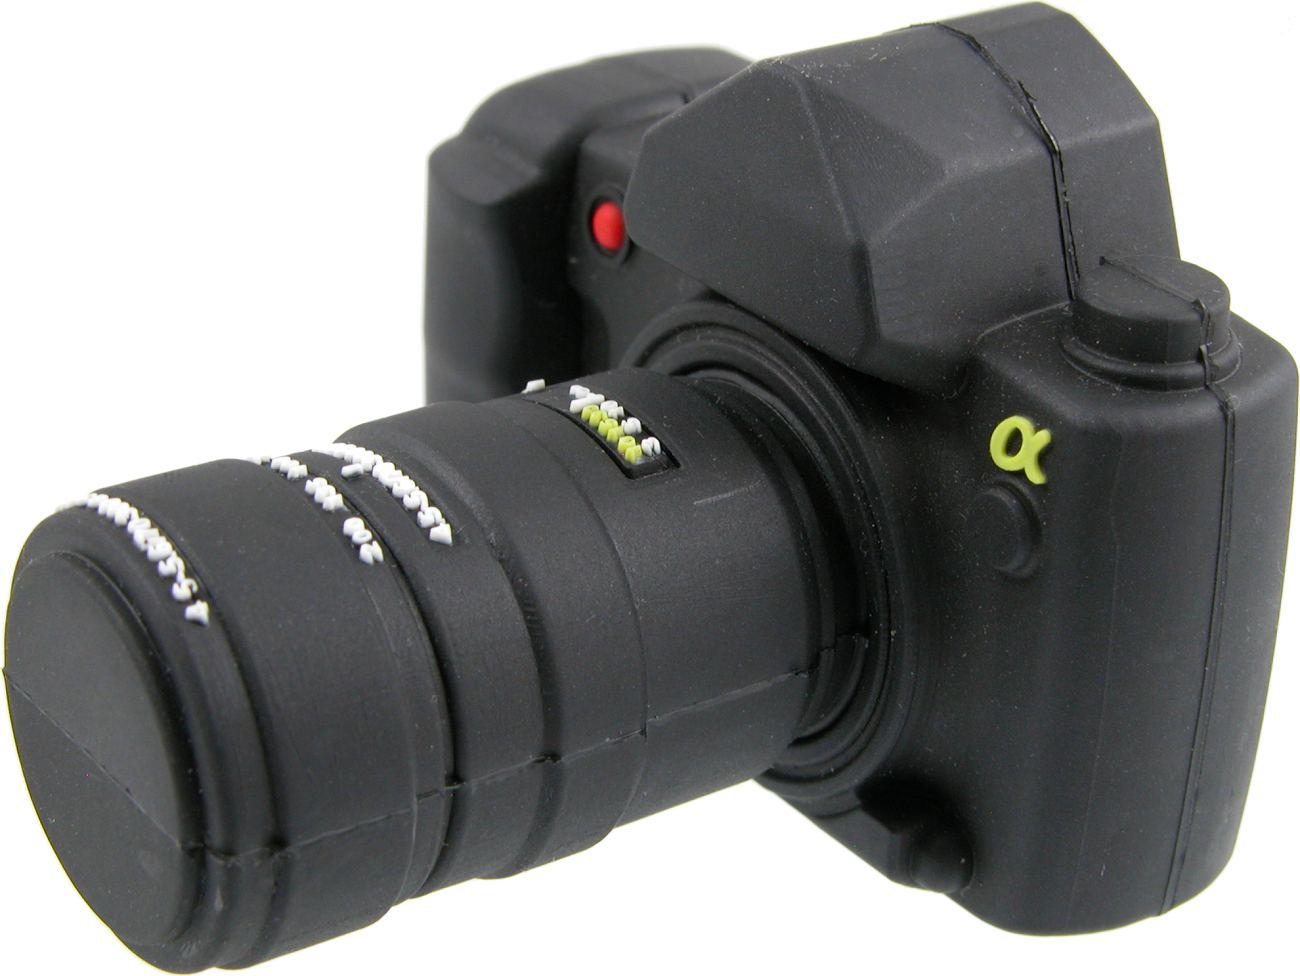 Coolest Usb Stick Alpha900 Camera Cd229